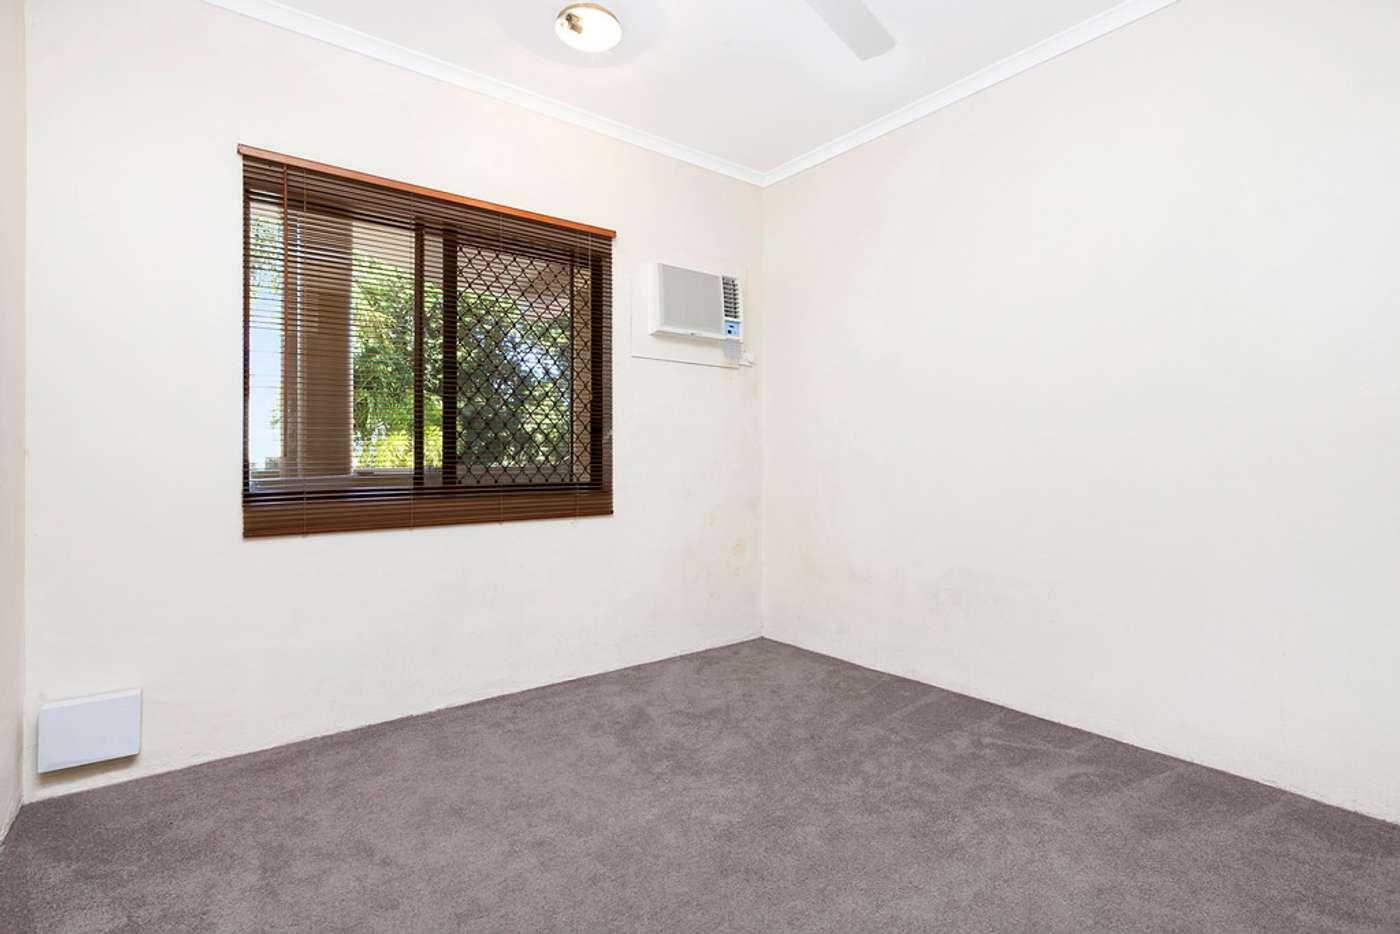 Sixth view of Homely unit listing, 7/18 Houston Street, Larrakeyah NT 820